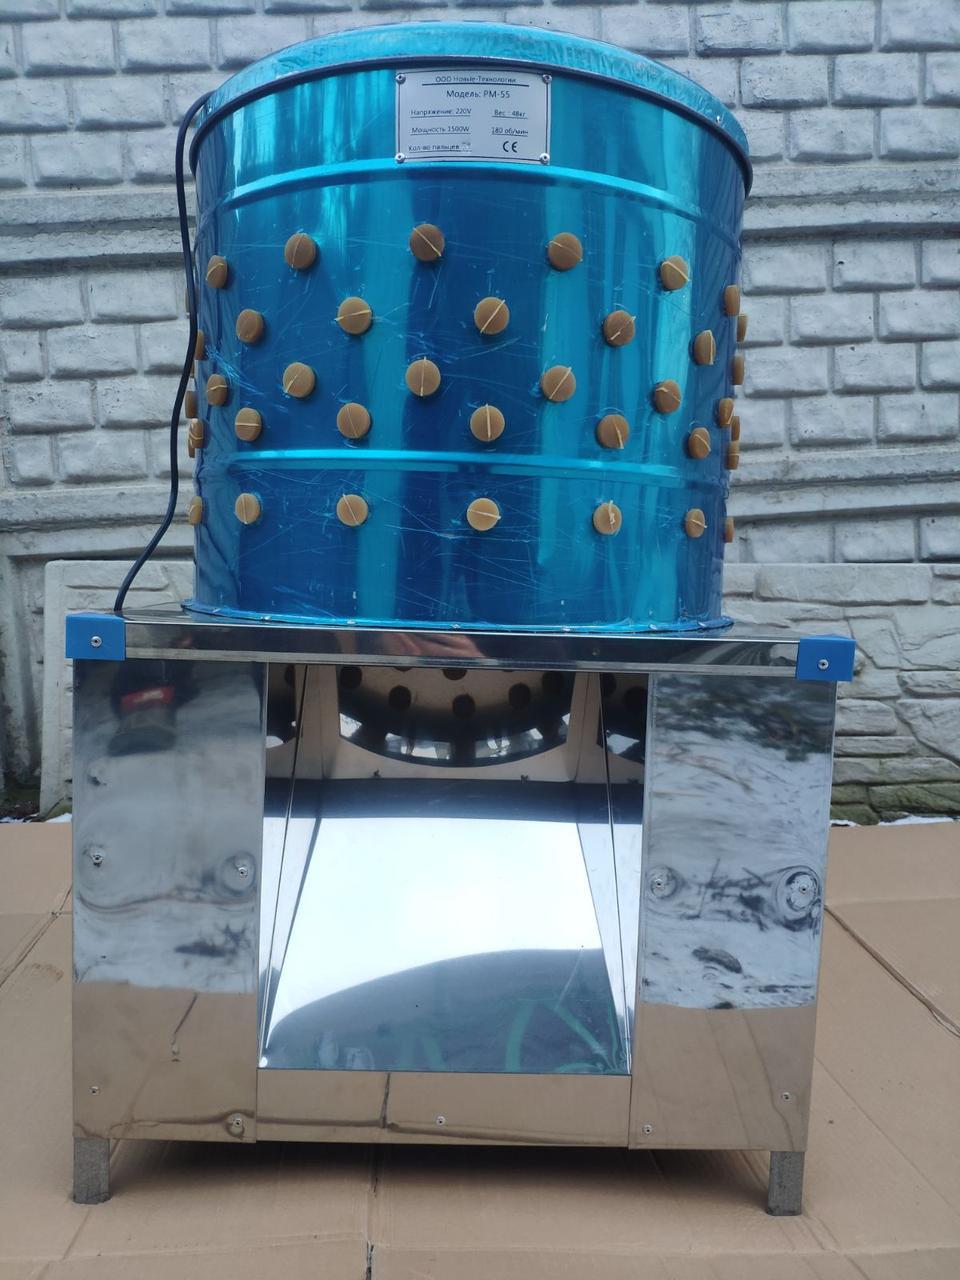 Машина для снятия оперения с птицы Н-Т РМ-55